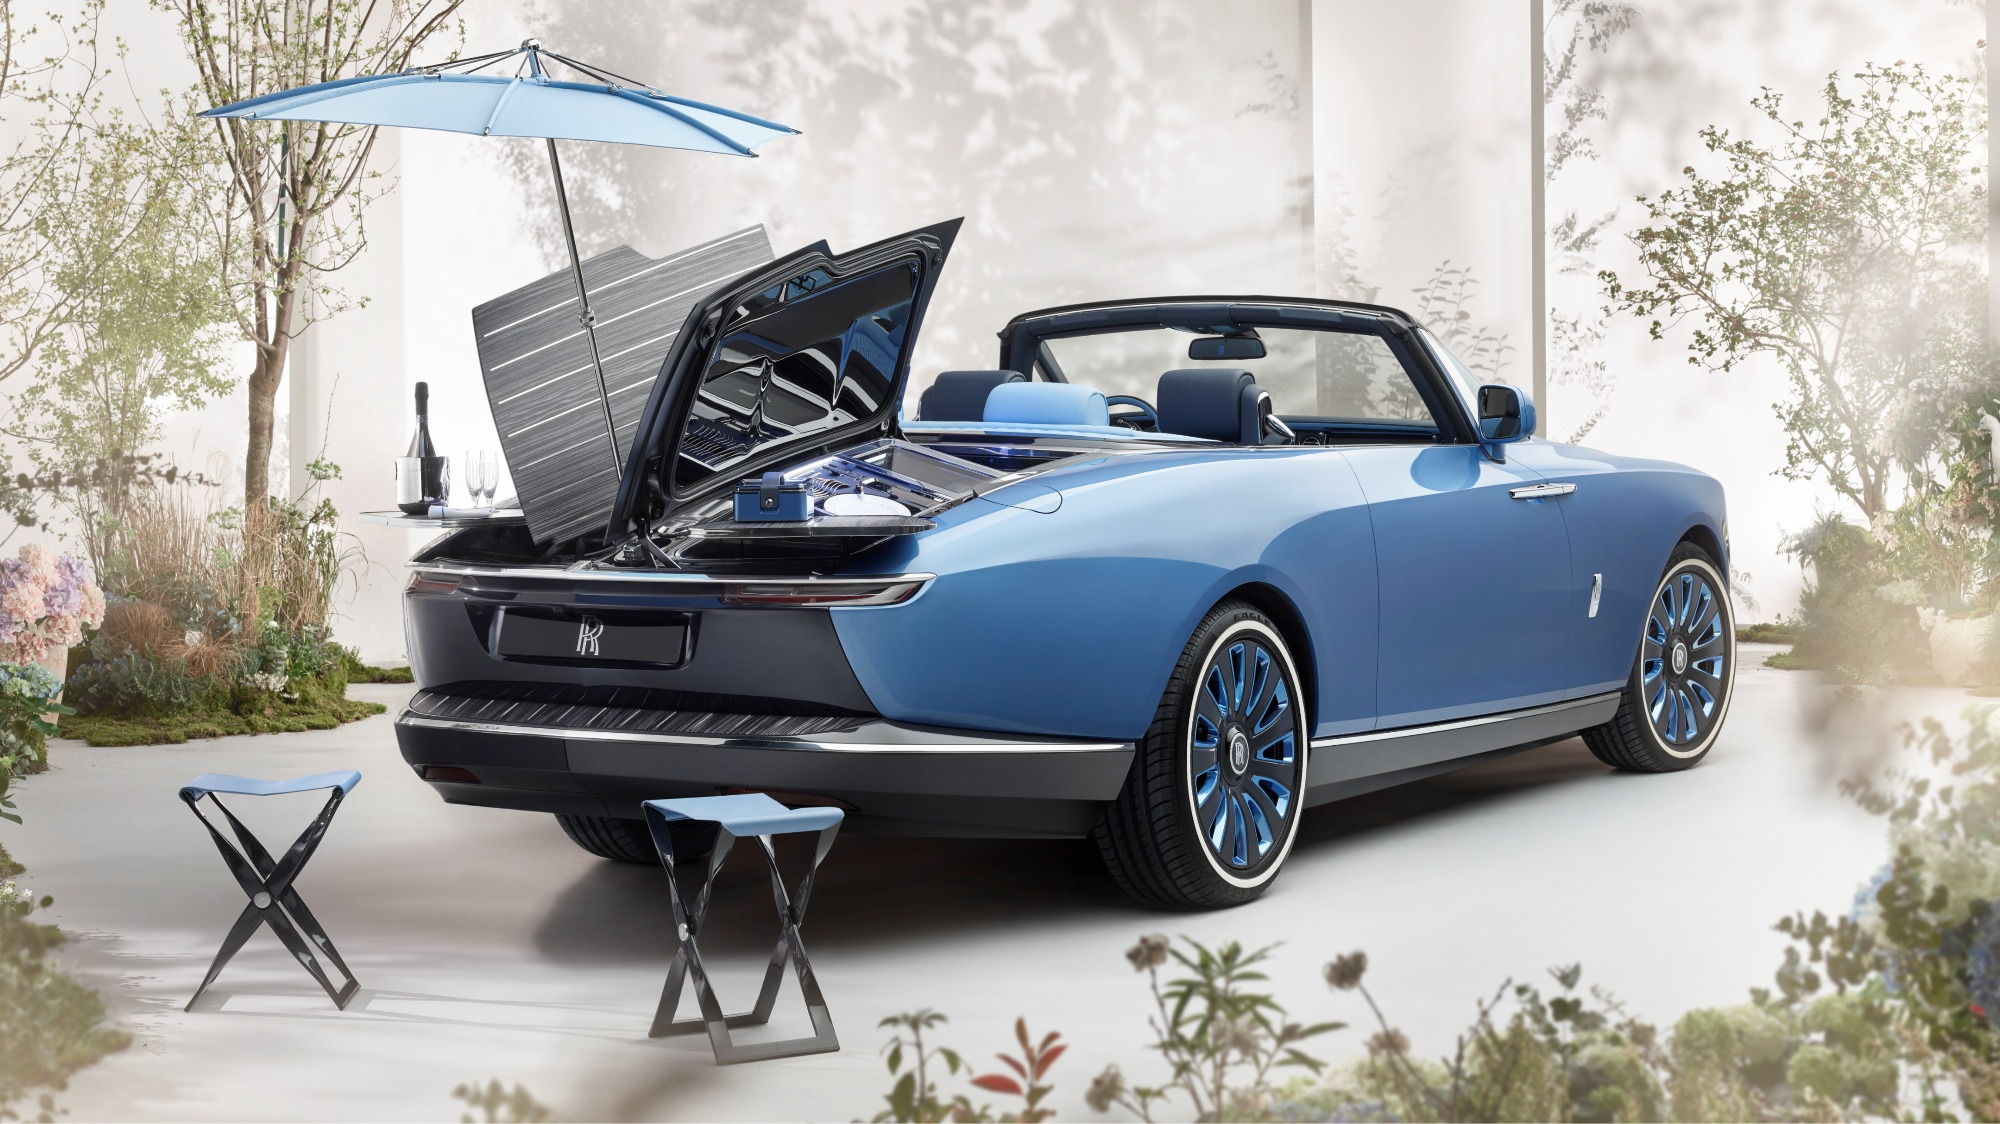 Rolls-Royce Boat Tail conversível azul visto por trás